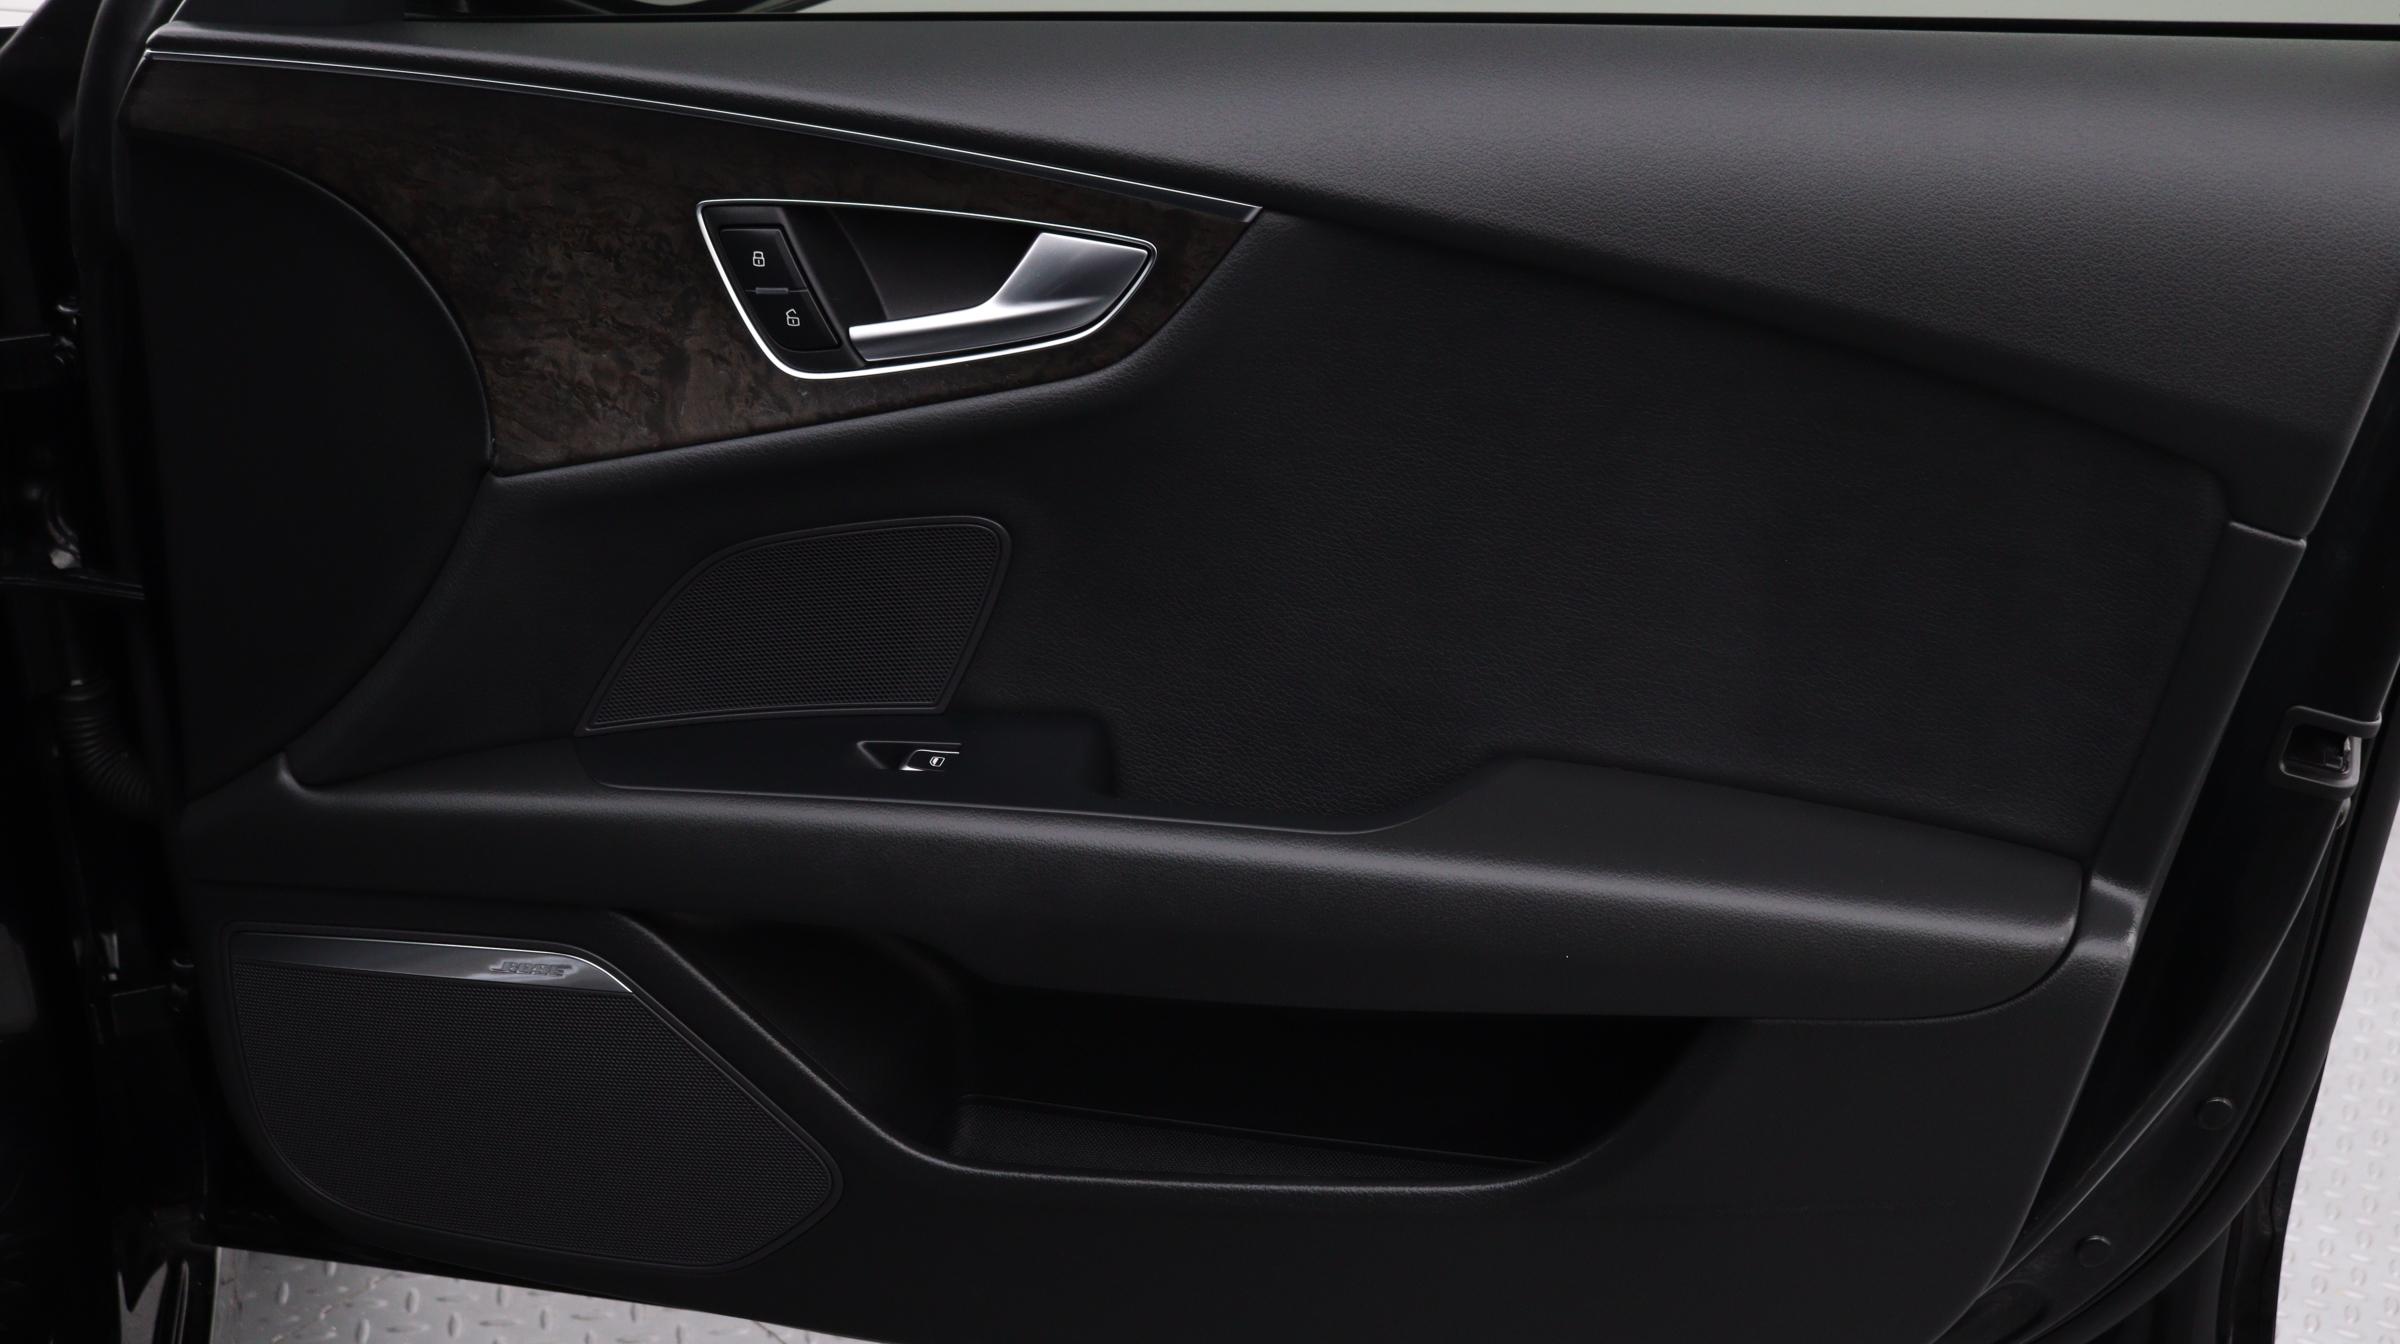 Florida Fine Cars - Used vehicle - Hatchback AUDI A7 2018